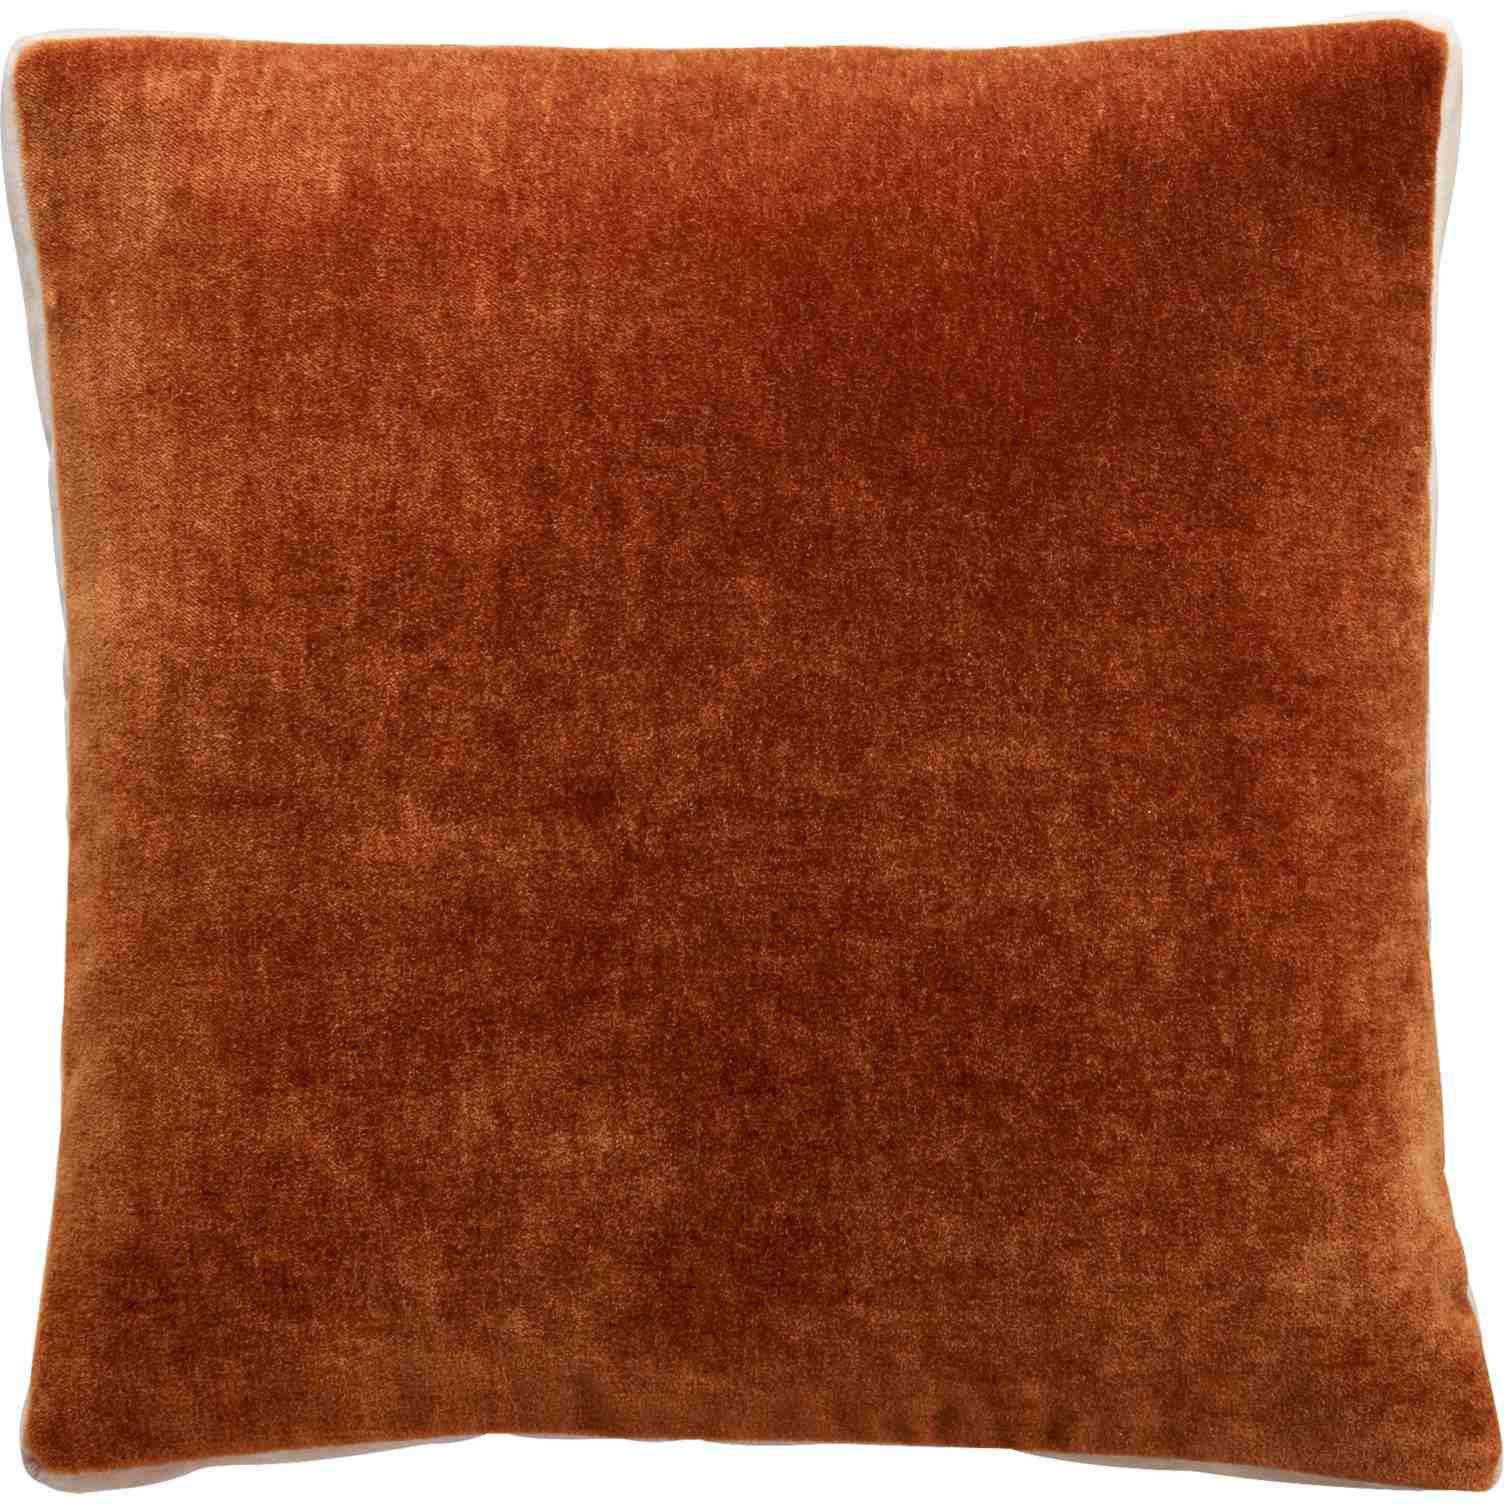 CB2 Cinnamon Mohair Pillow